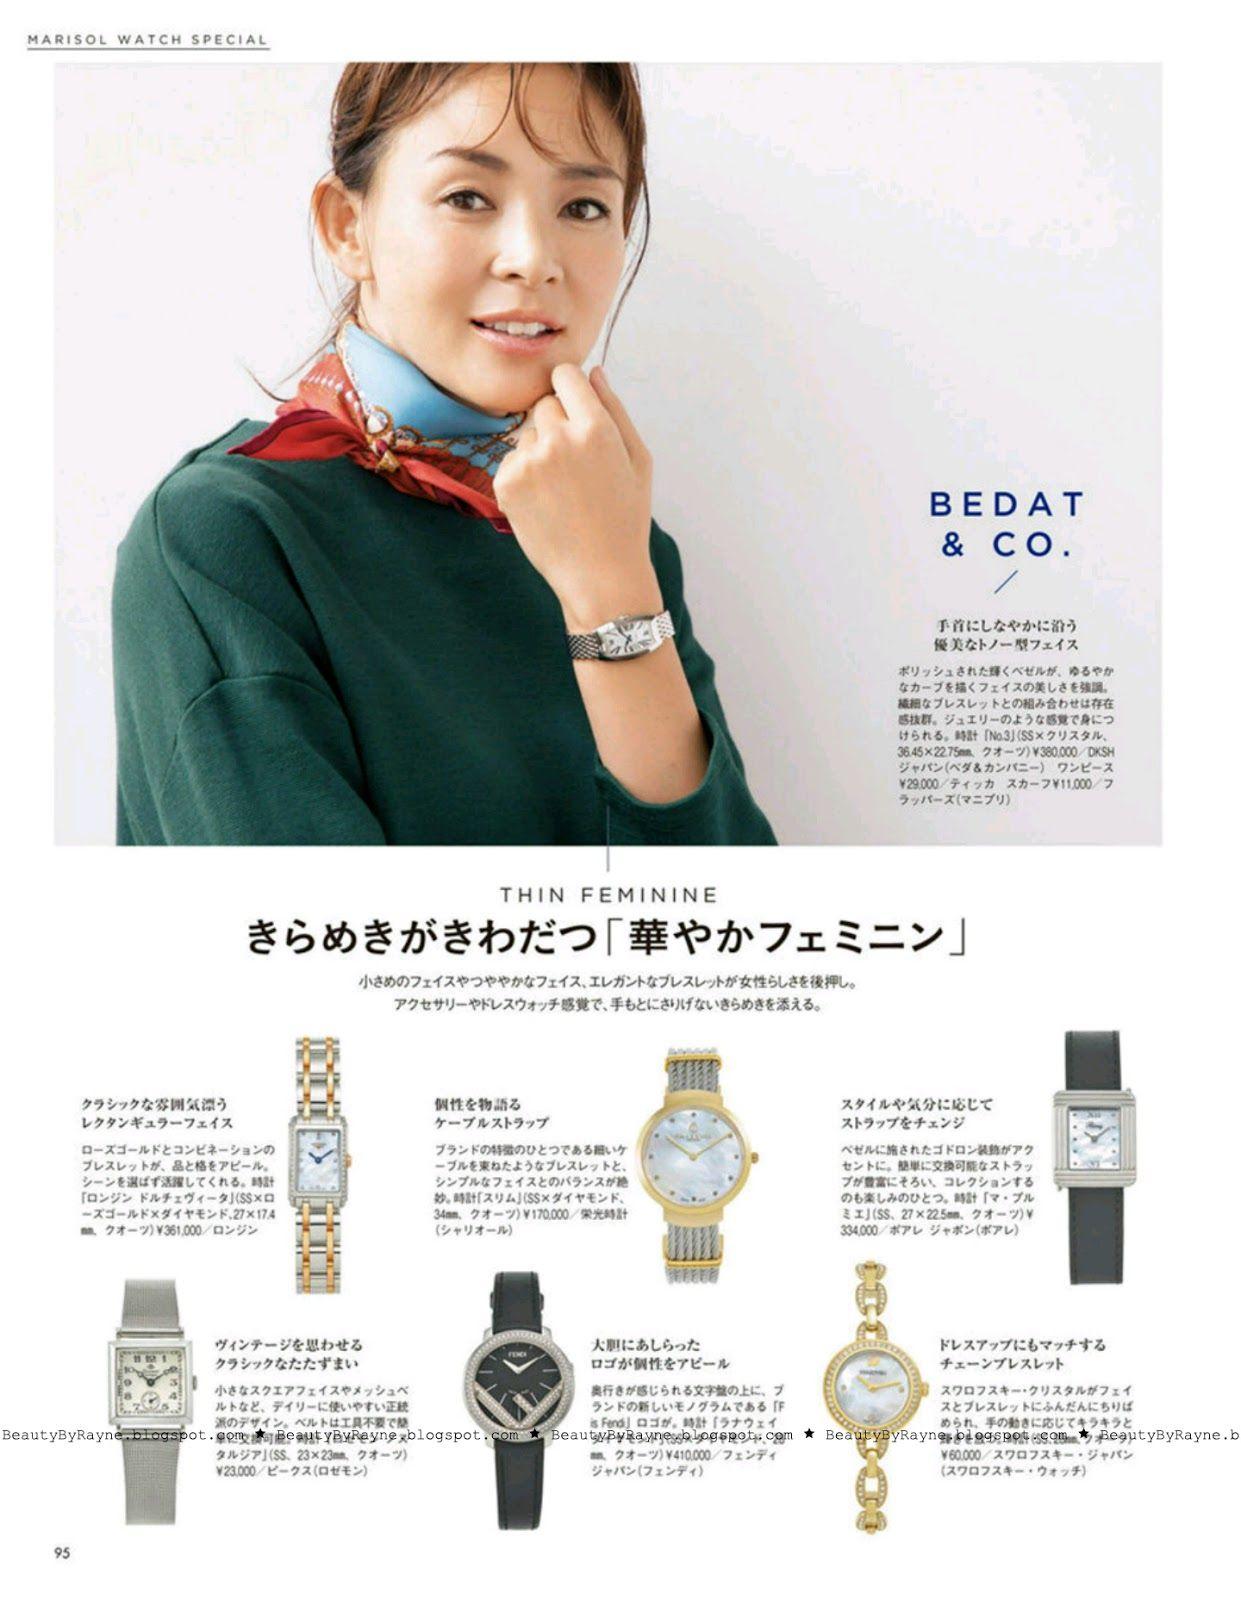 marisol january 2019 issue free japanese fashion magazine scans trong 2020 thời trang thời trang nữ